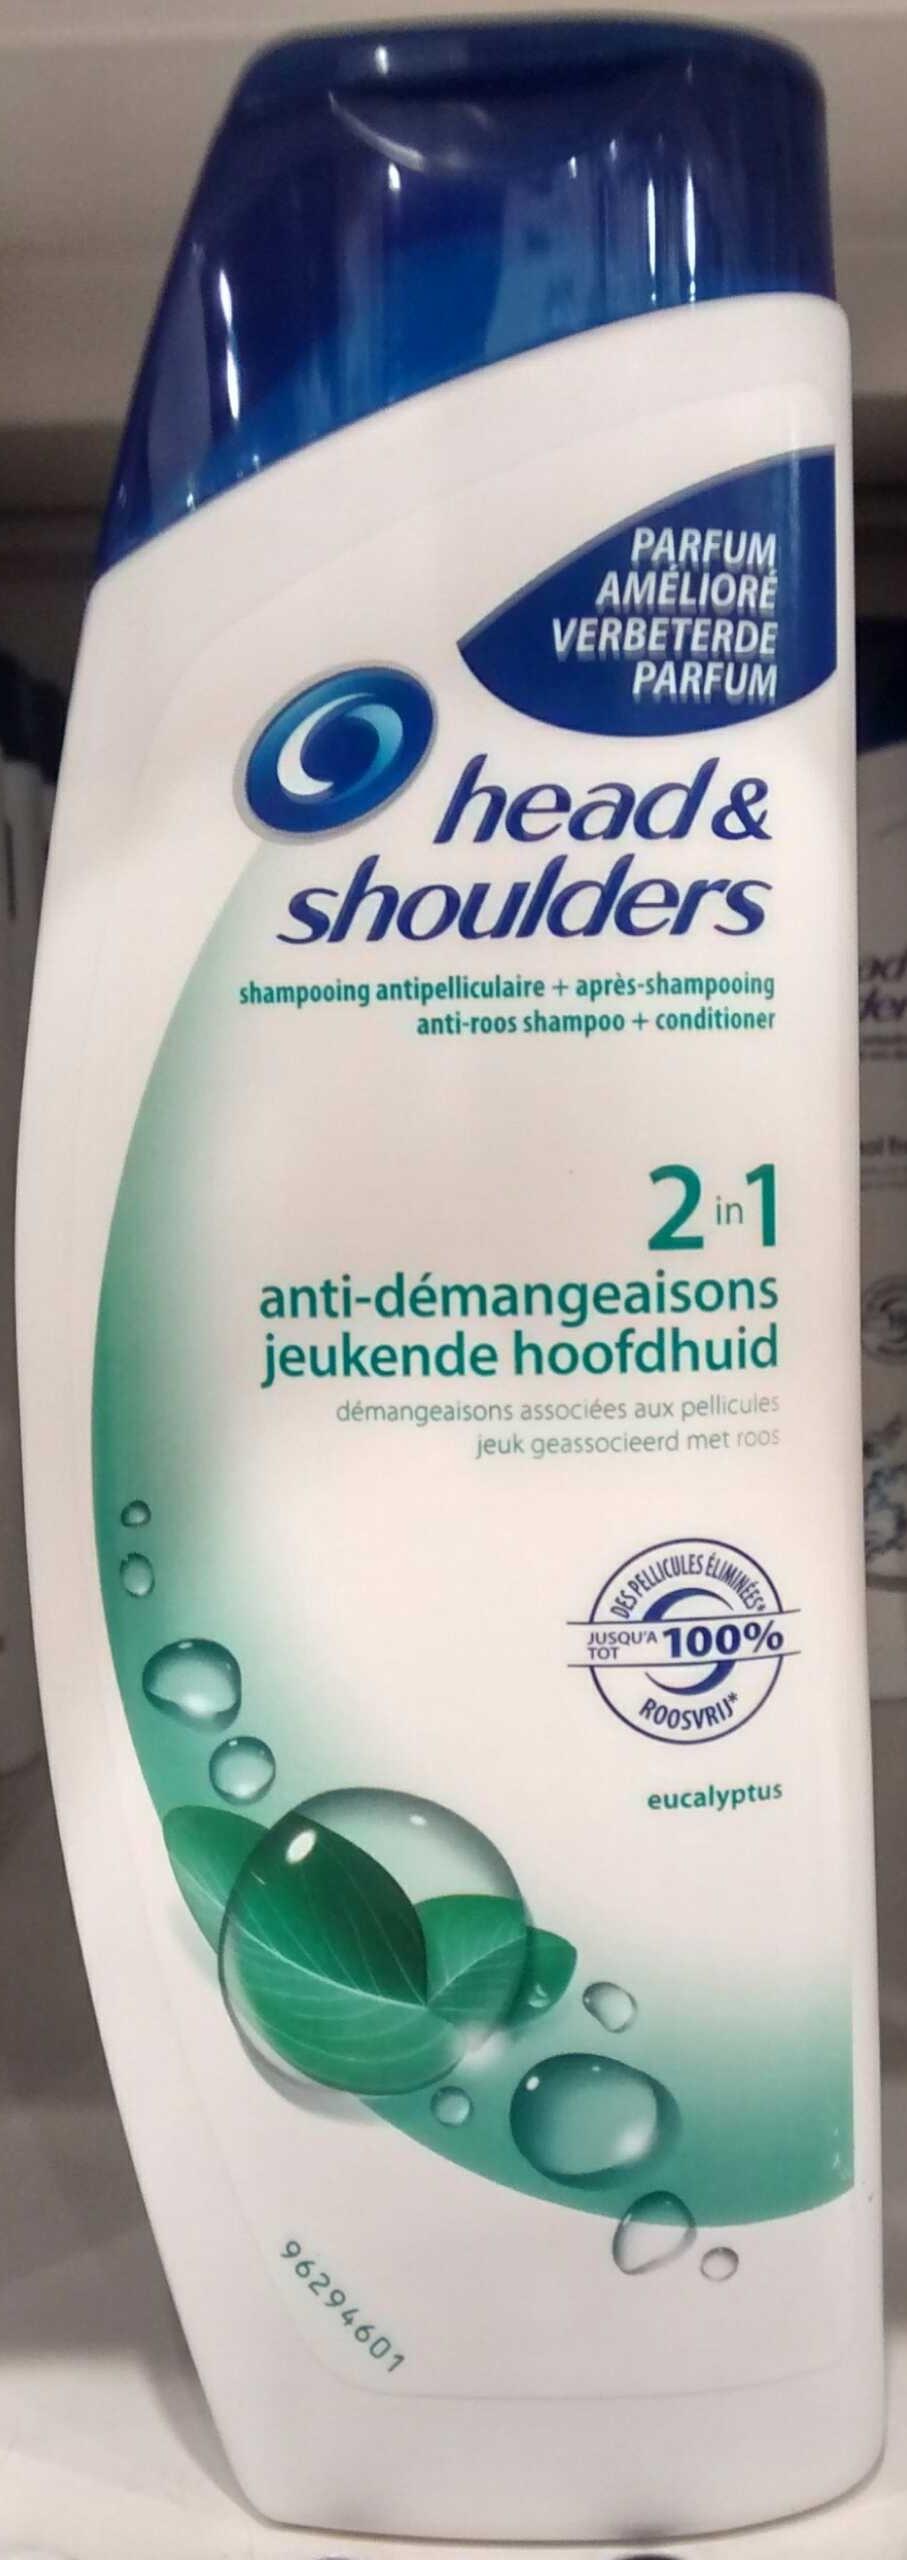 Shampooing antipelliculaire + après shampooing anti-démangeaisons 2 en 1 - Product